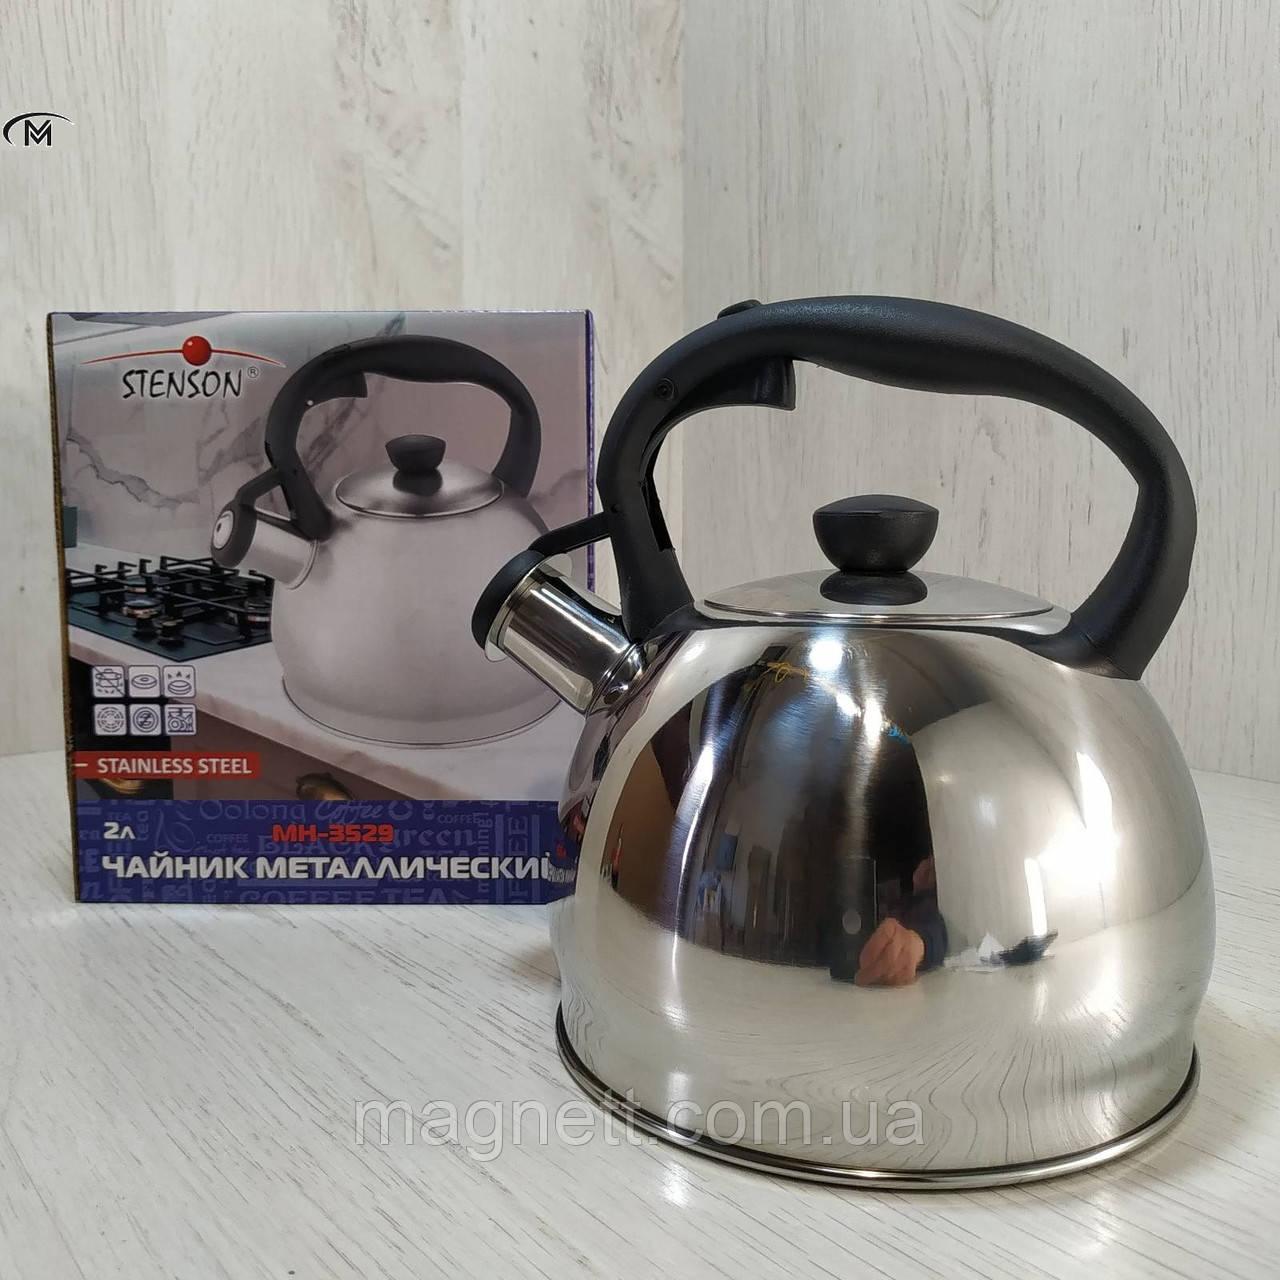 Чайник металлический Stenson MH-3529 2.0 л